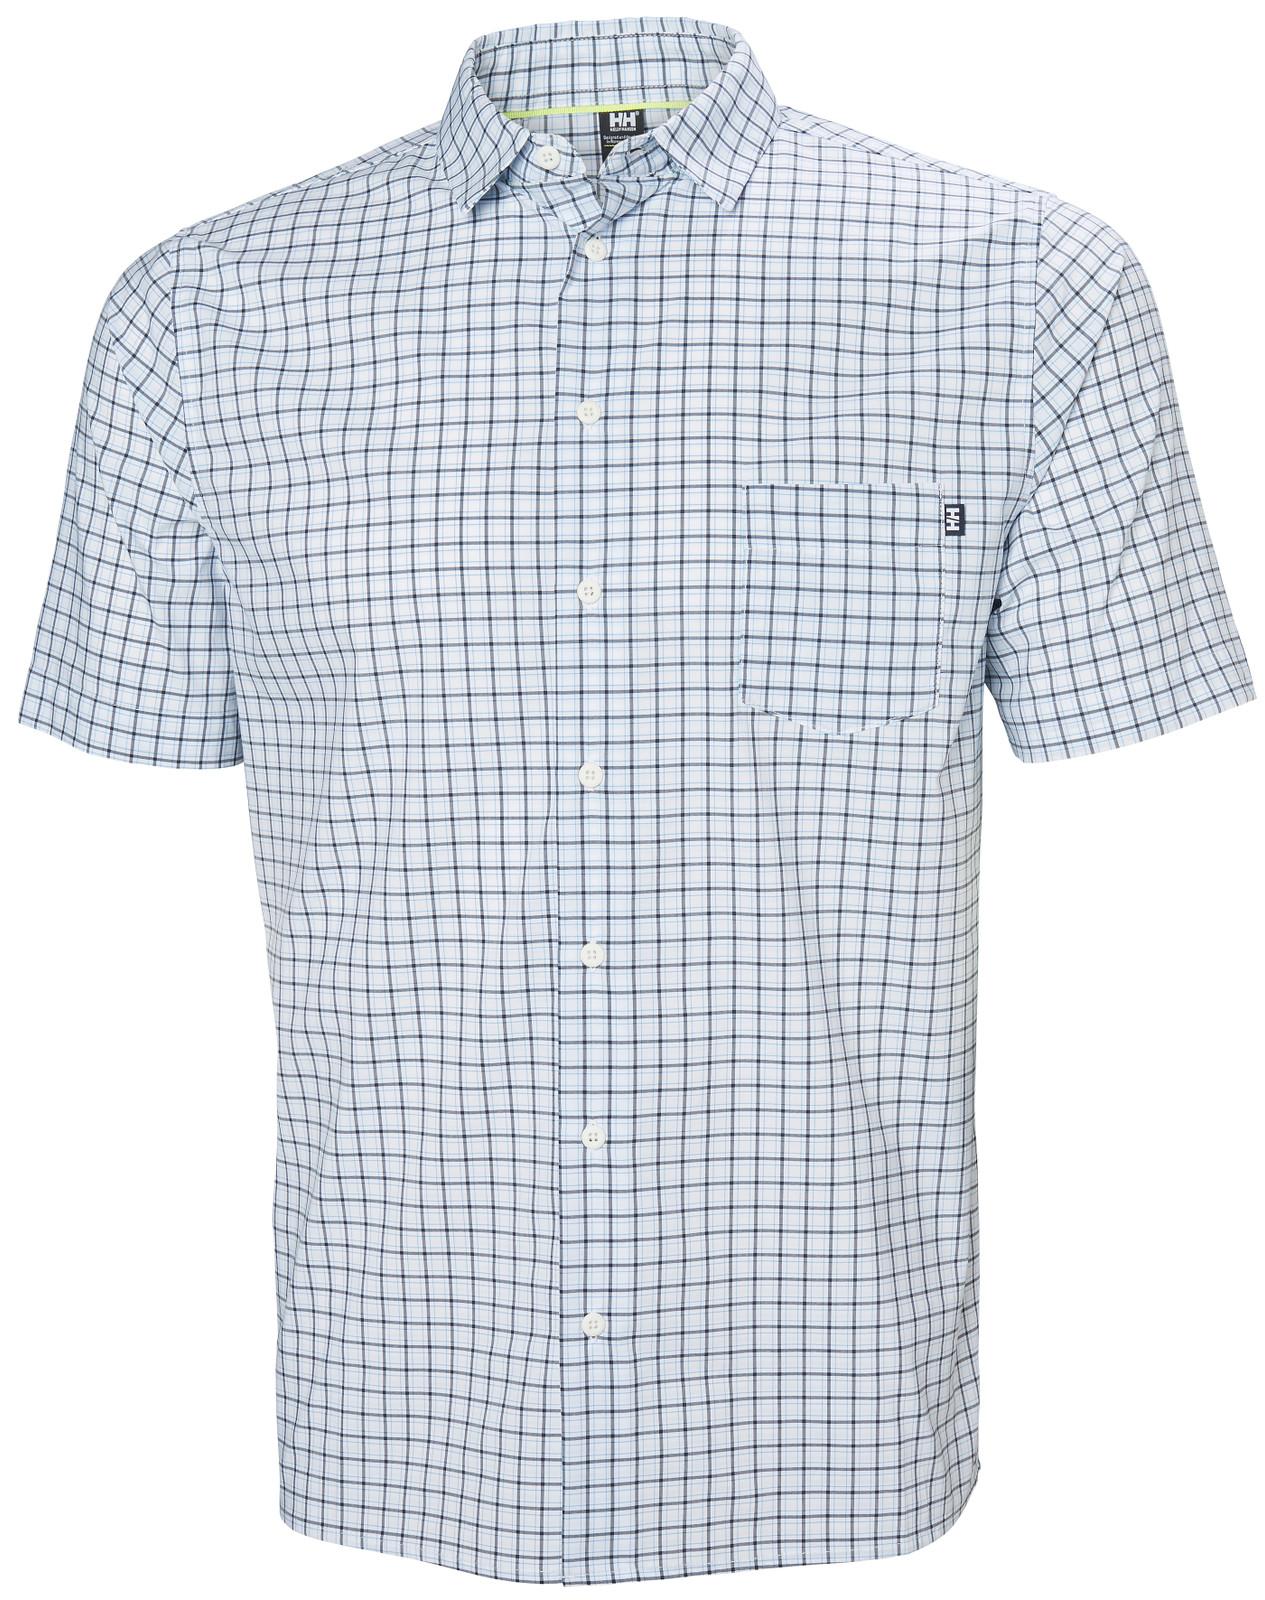 Helly Hansen Fjord QD SS Shirt, Men's - White Check, 34048-001